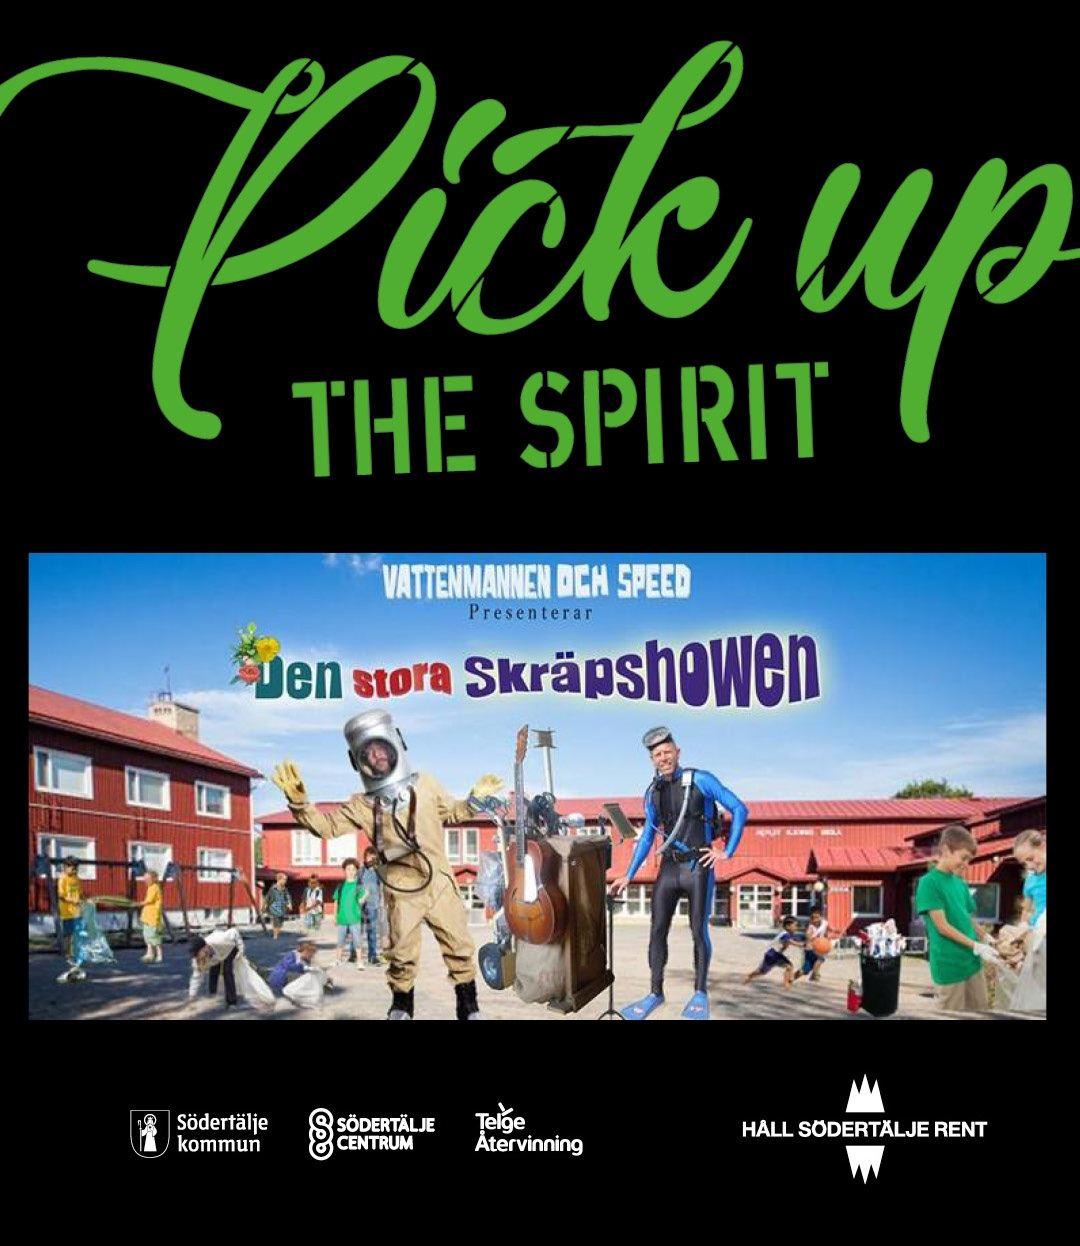 Pick up the spirit!